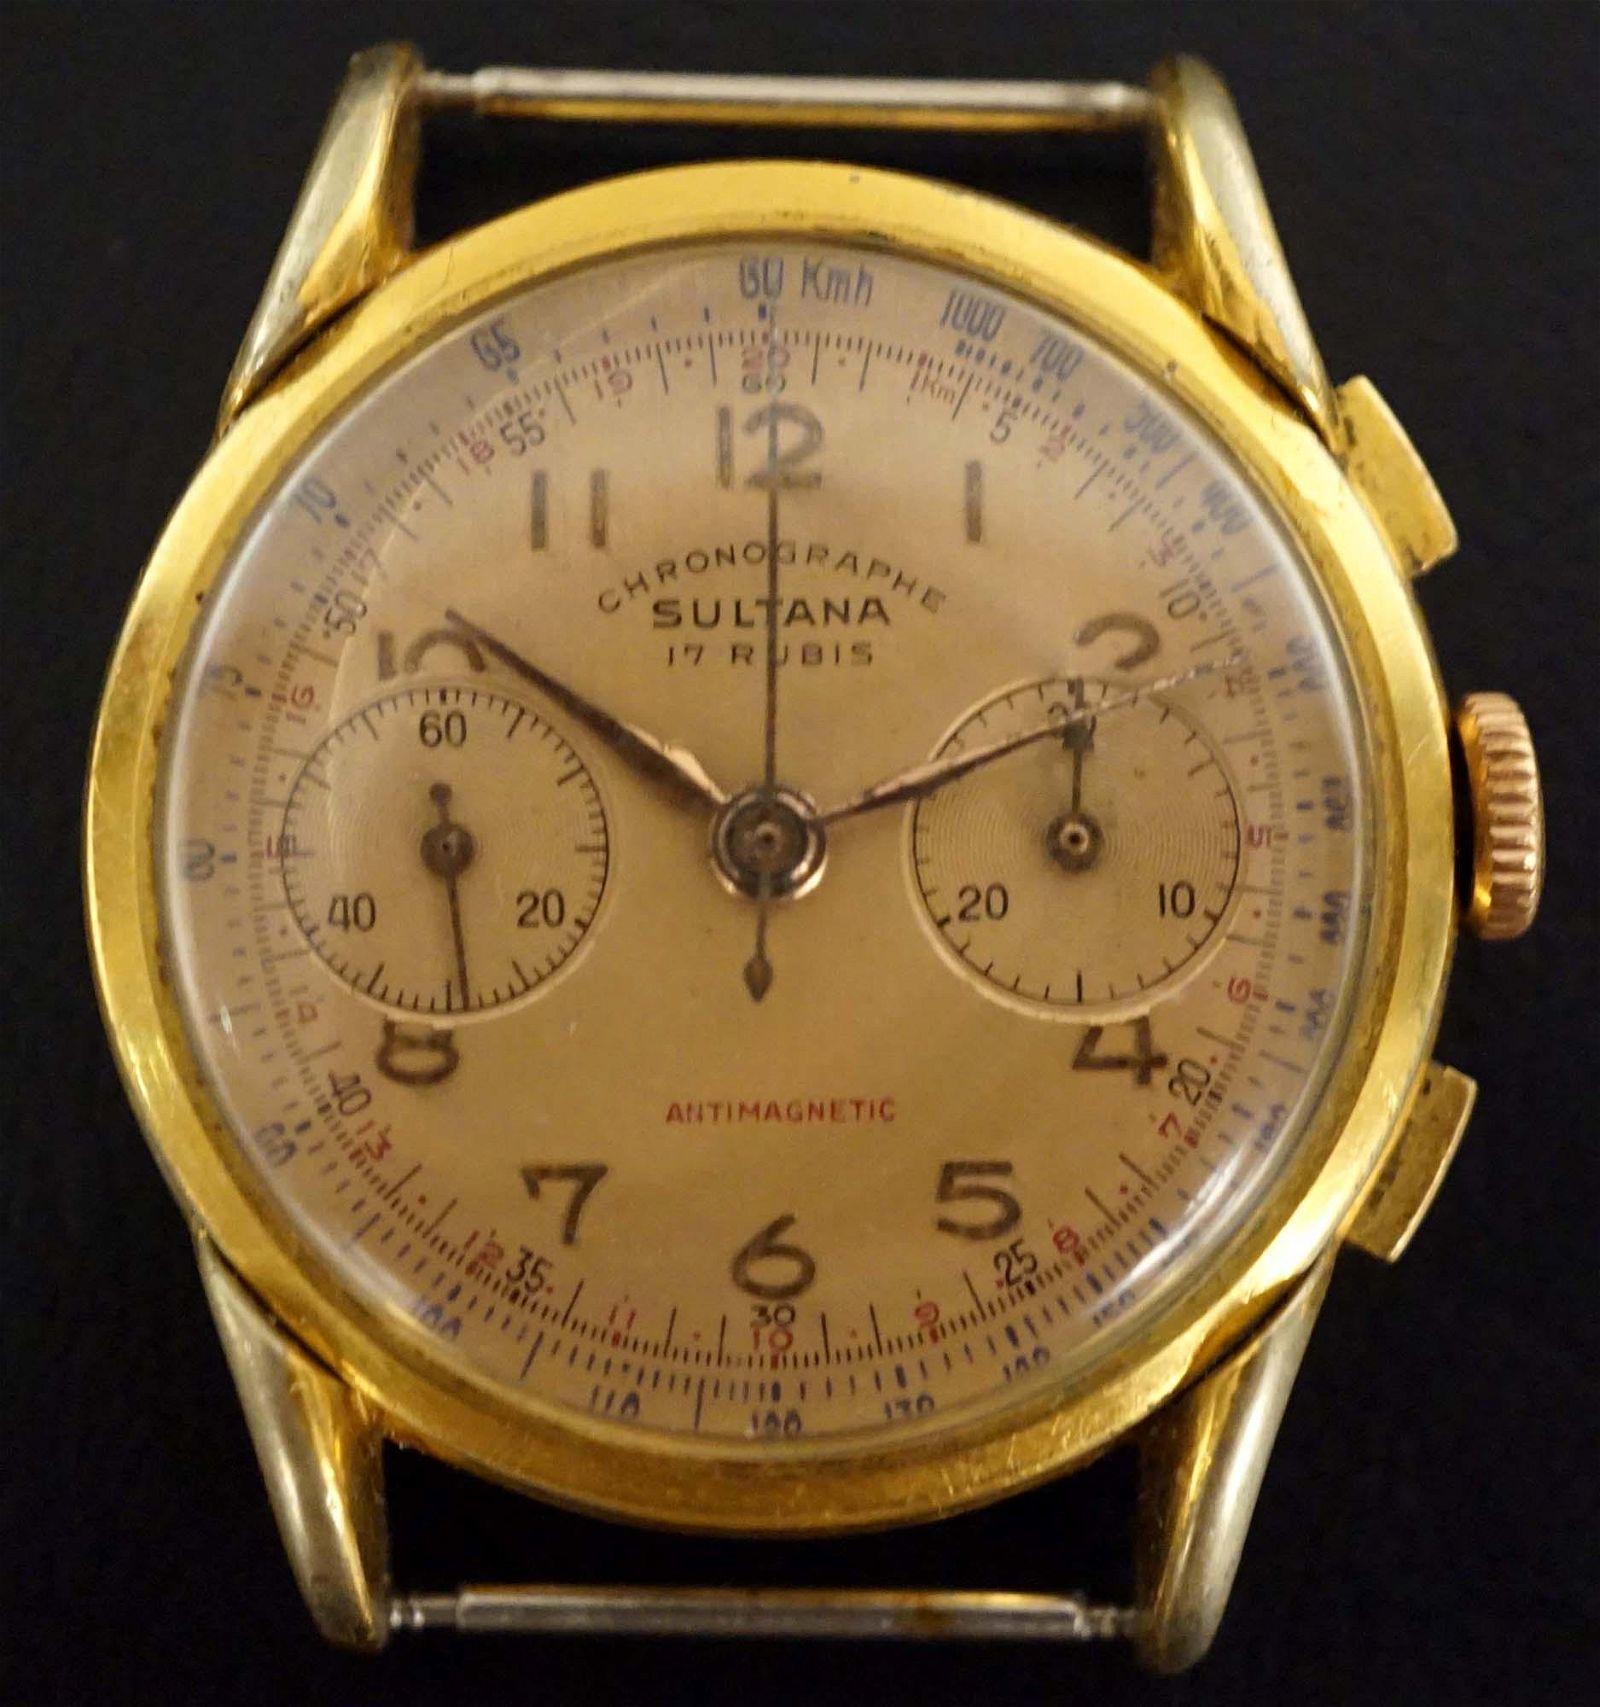 Sultana - Landeron chronograph watch - c.1940